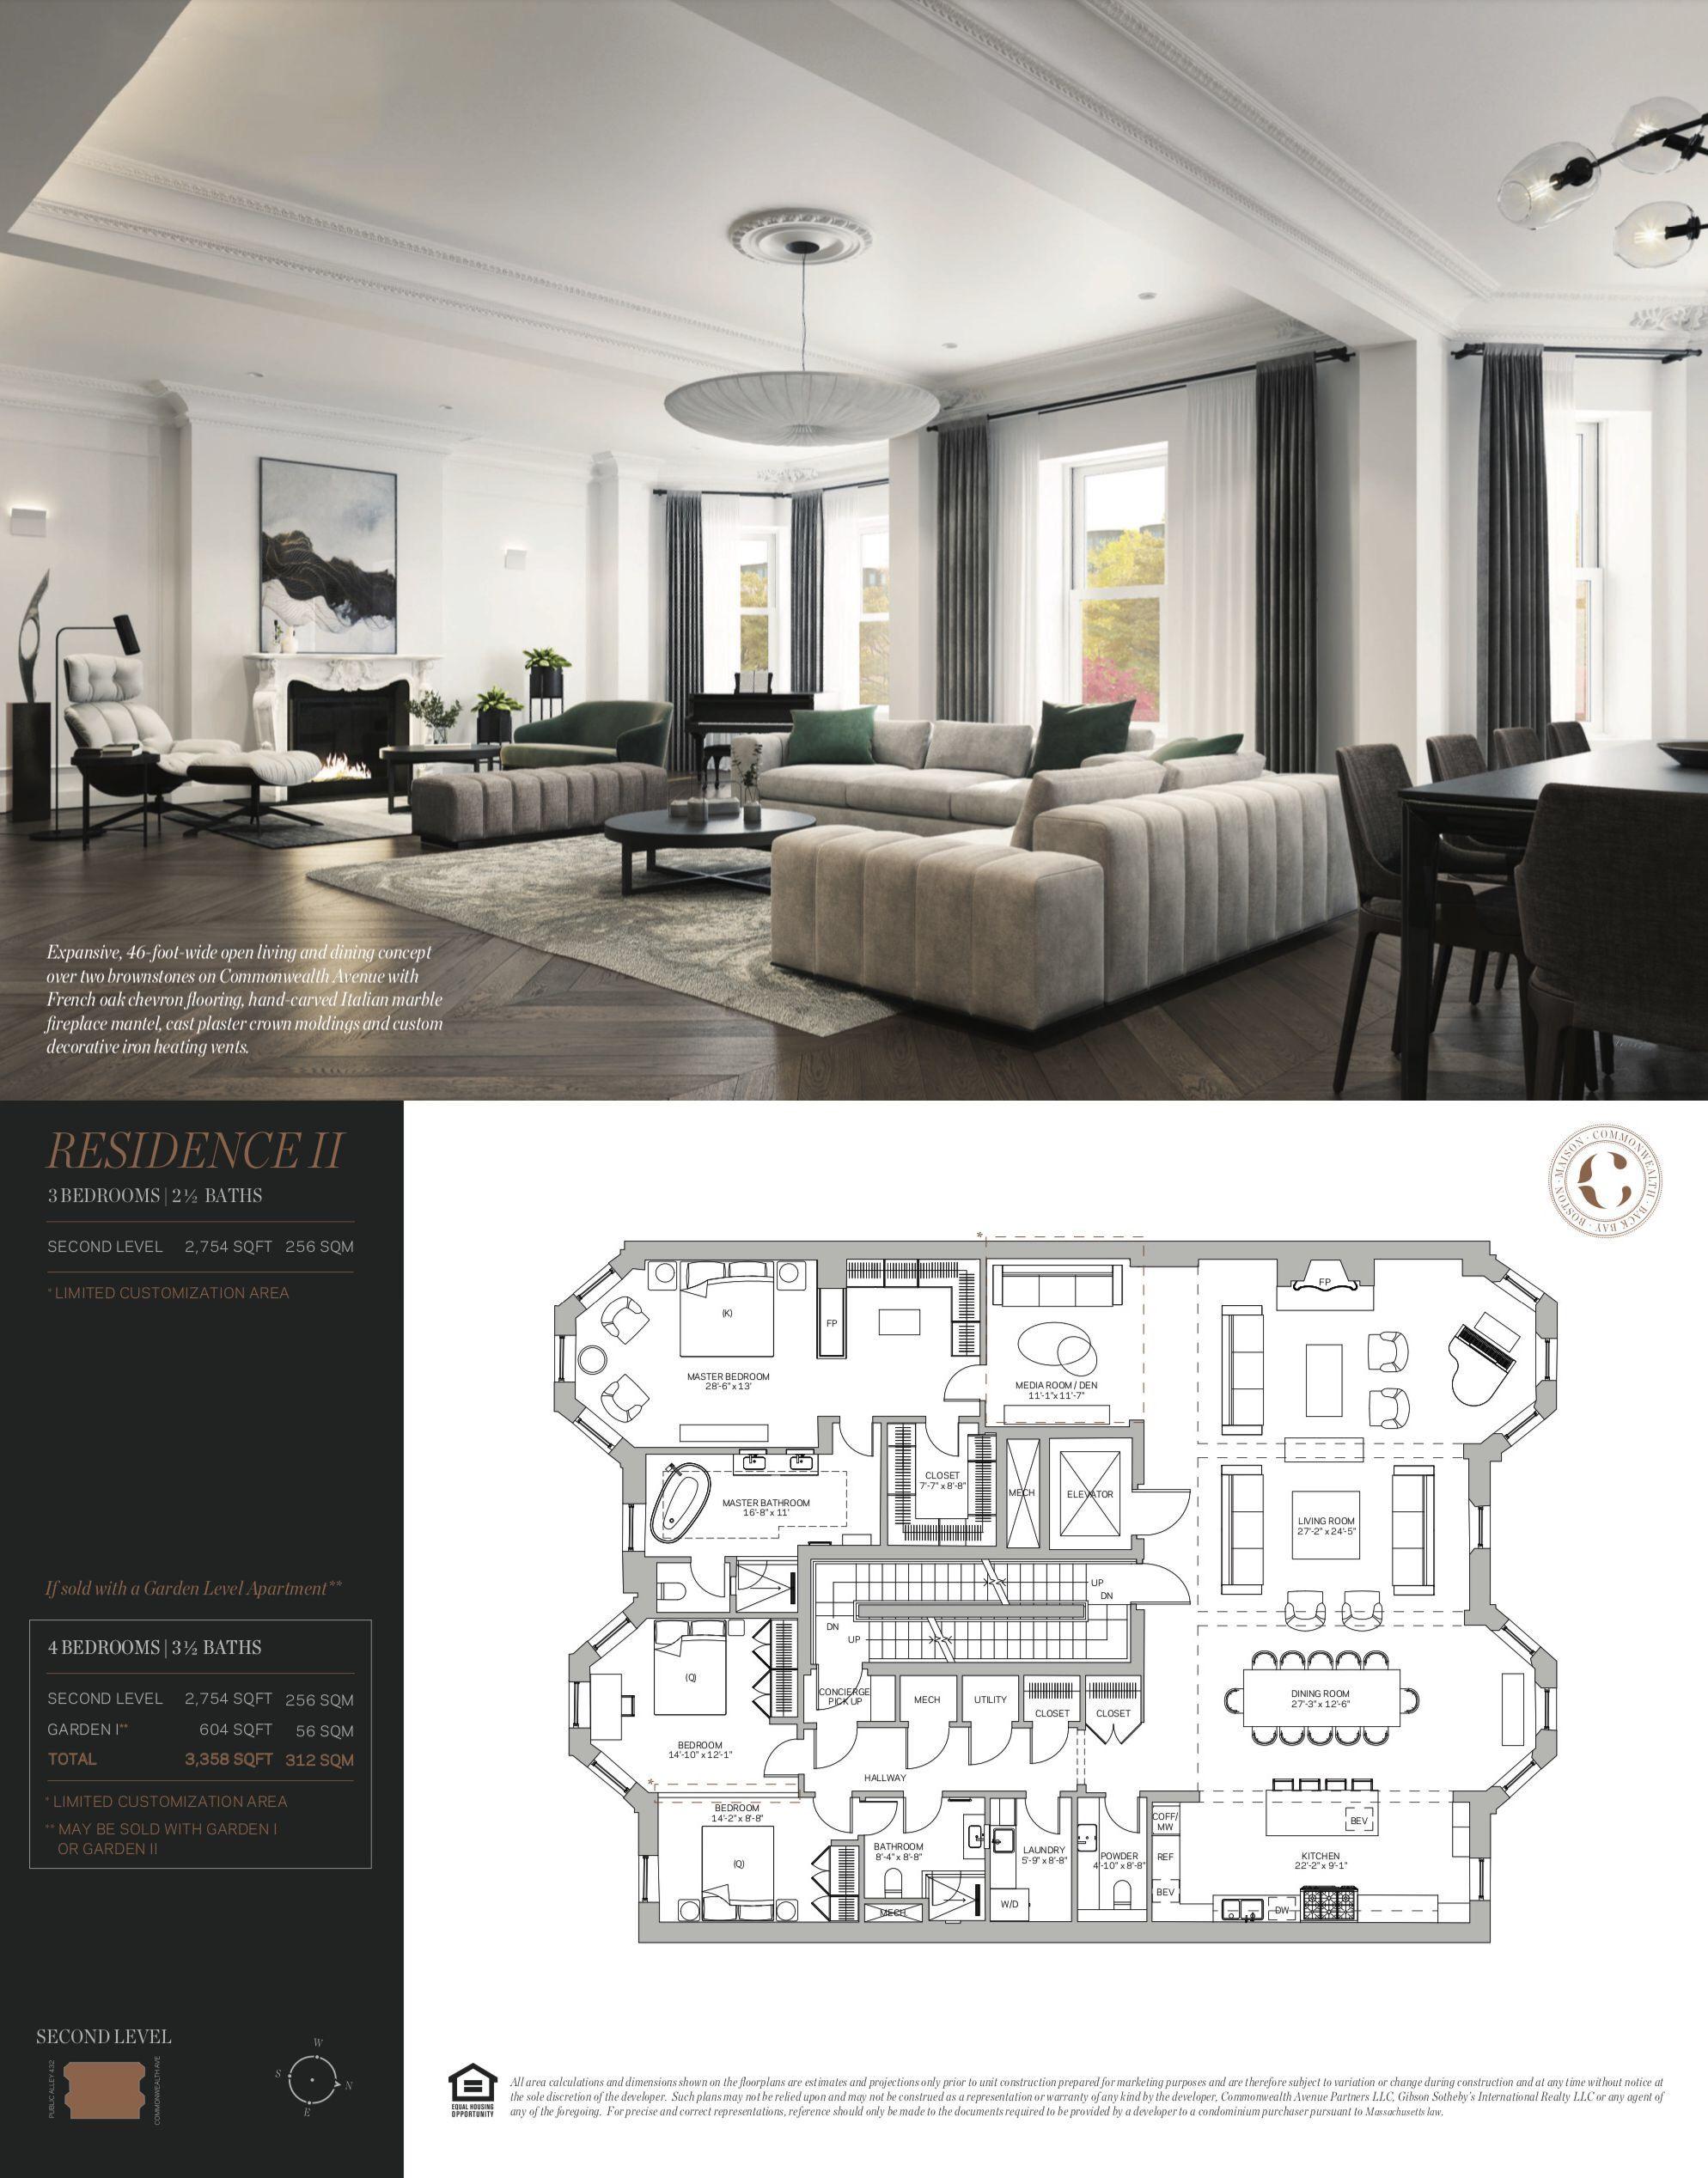 Maison Commonwealth Back Bay Boston Residence 2 Home Building Design Penthouse Apartment Floor Plan Apartment Floor Plans